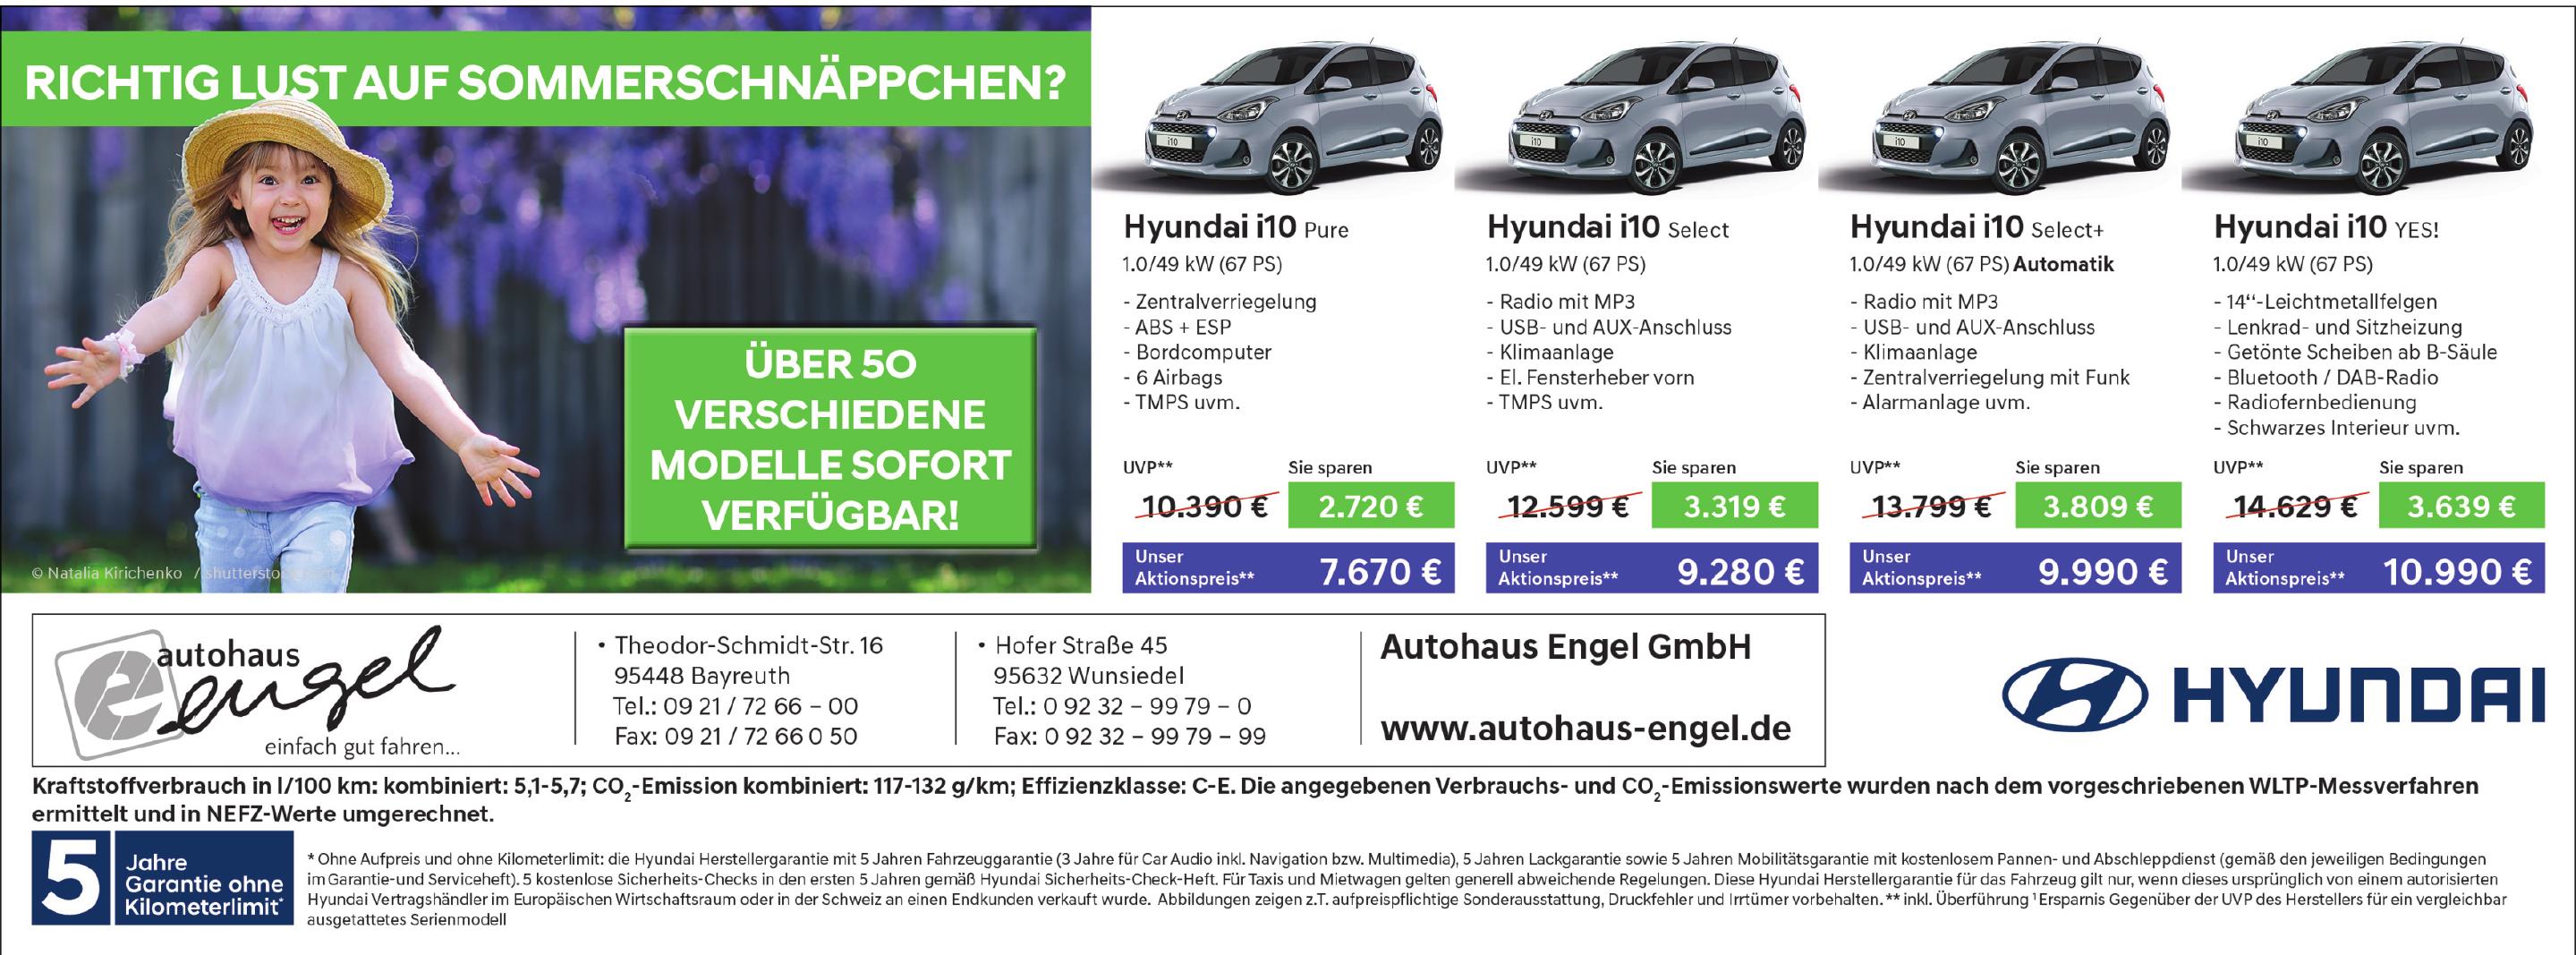 Autohaus Engel GmbH